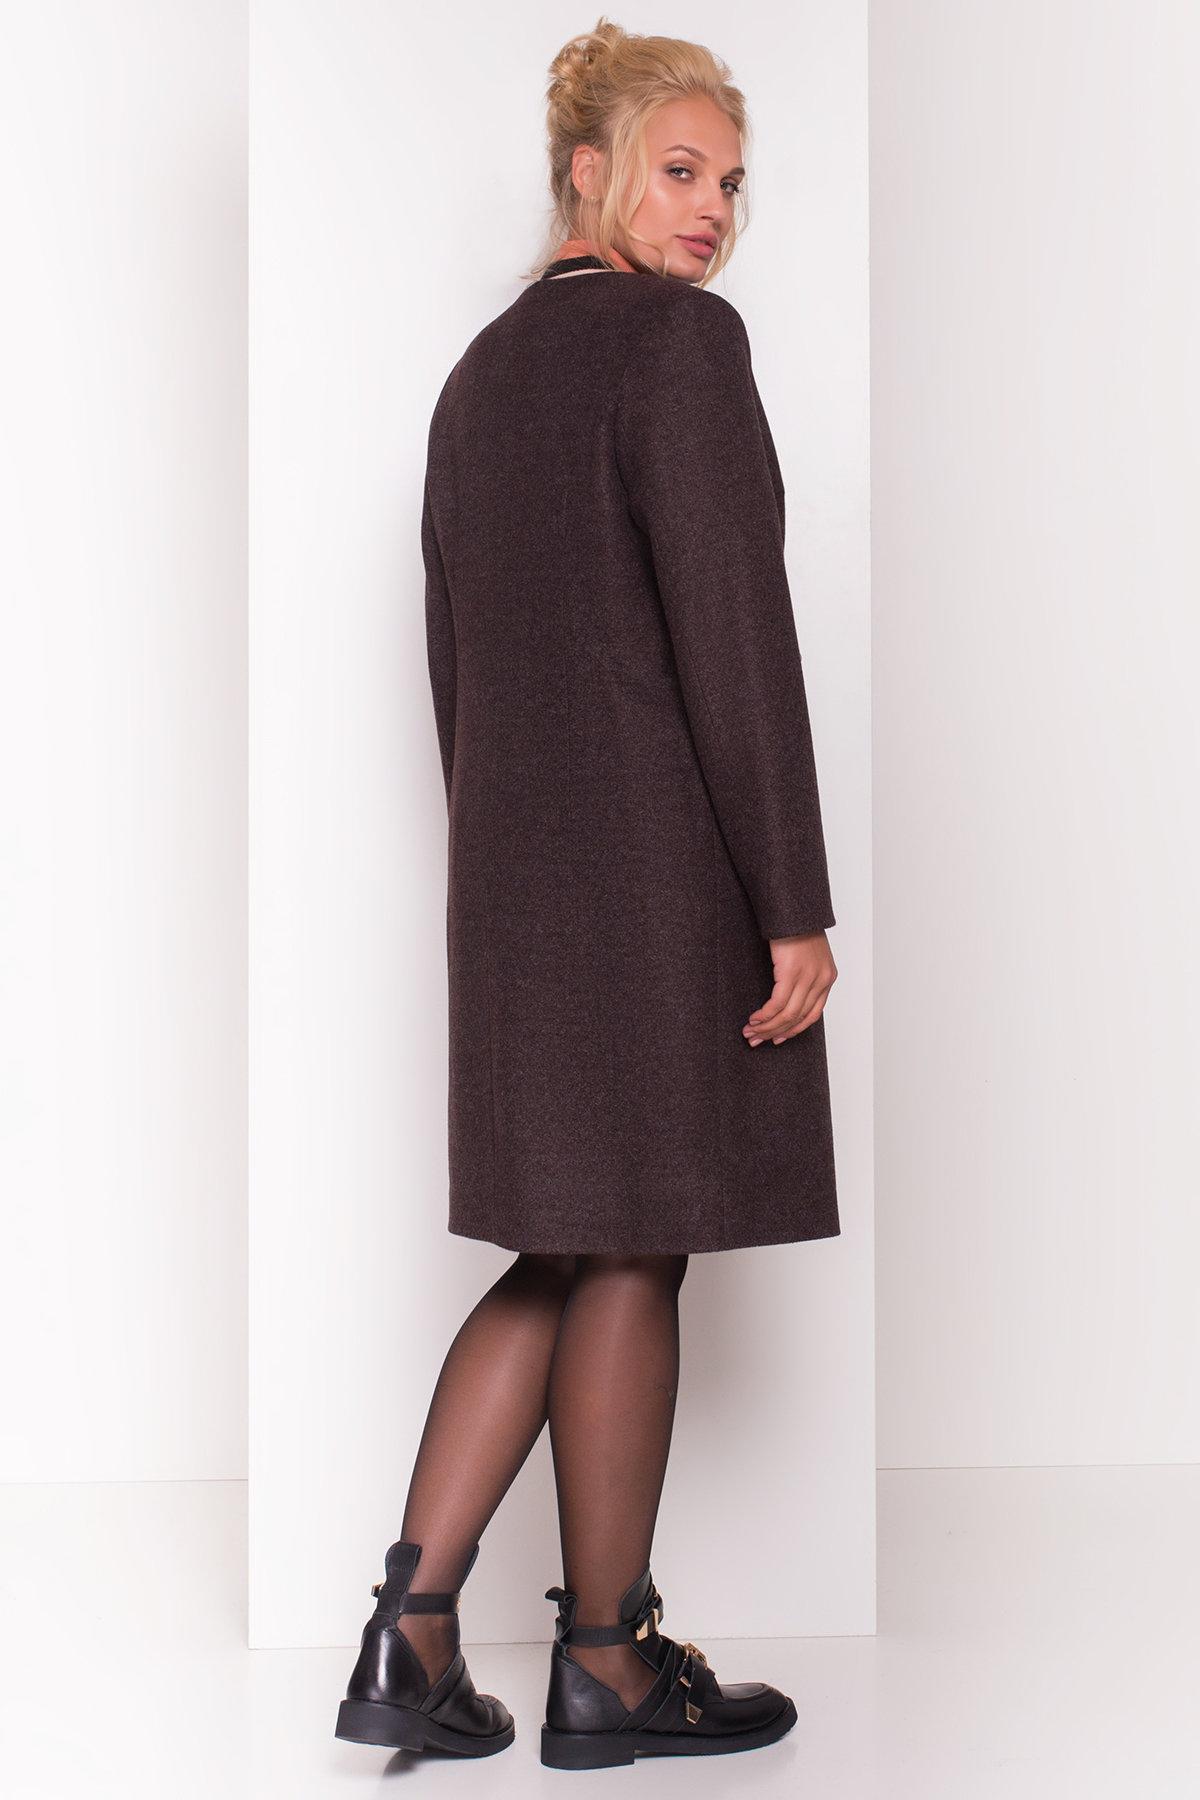 Пальто без воротника Фортуна лайт Donna 4464 Цвет: Шоколад